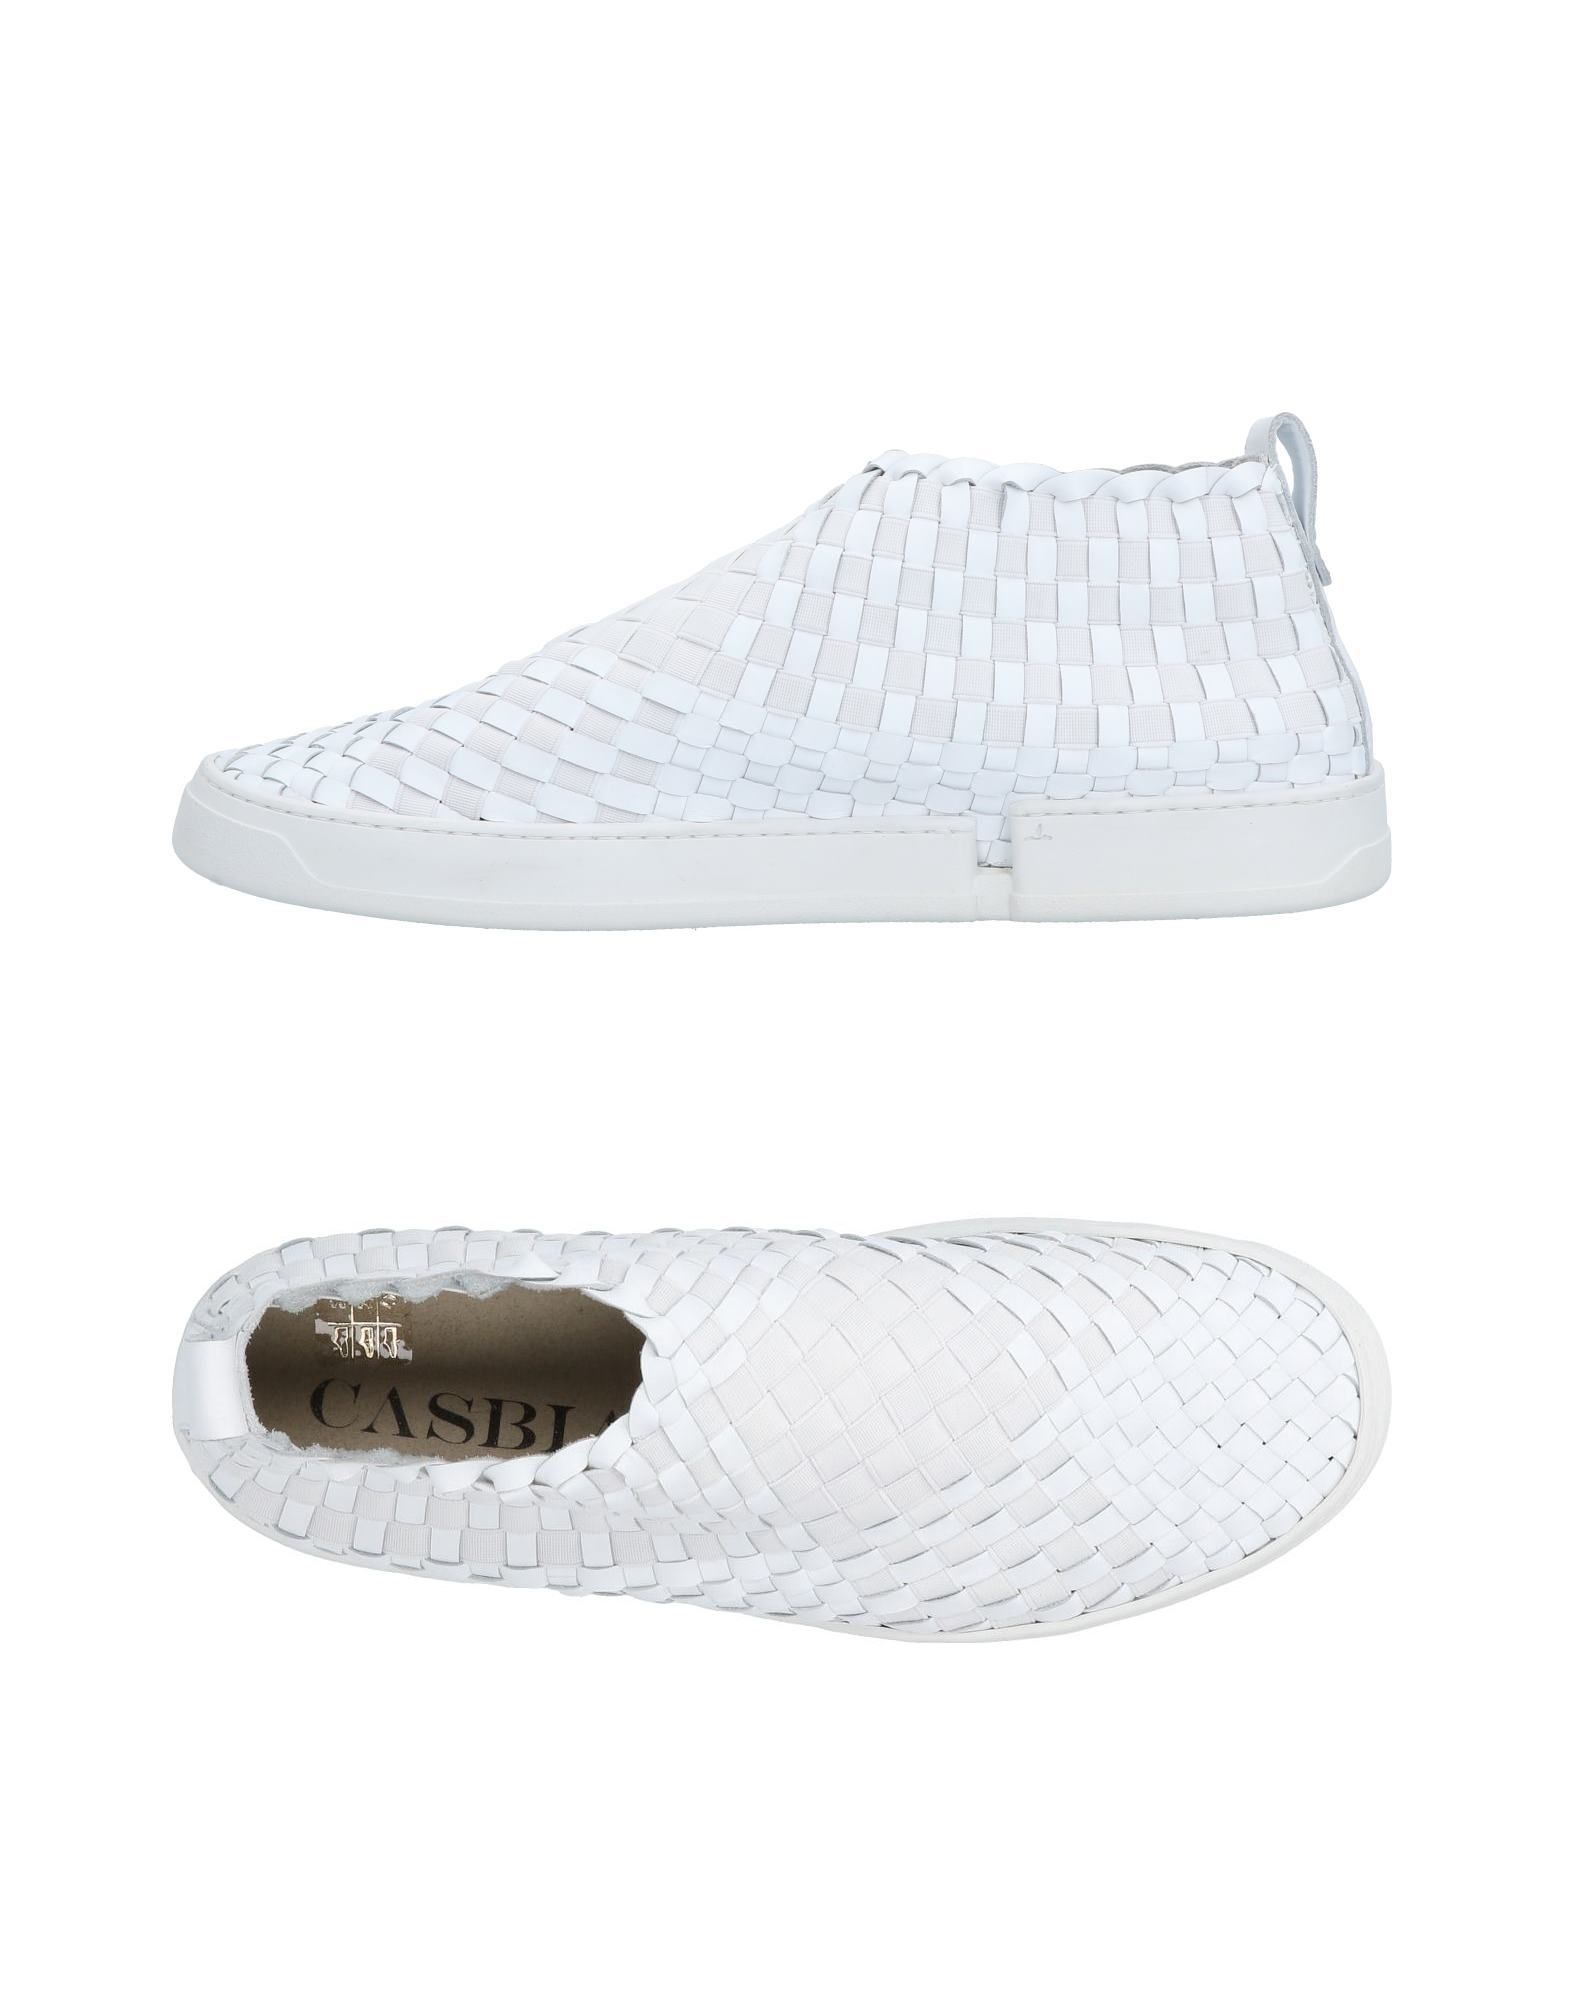 Casbia Sneakers Herren  11485791KI Gute Qualität beliebte Schuhe